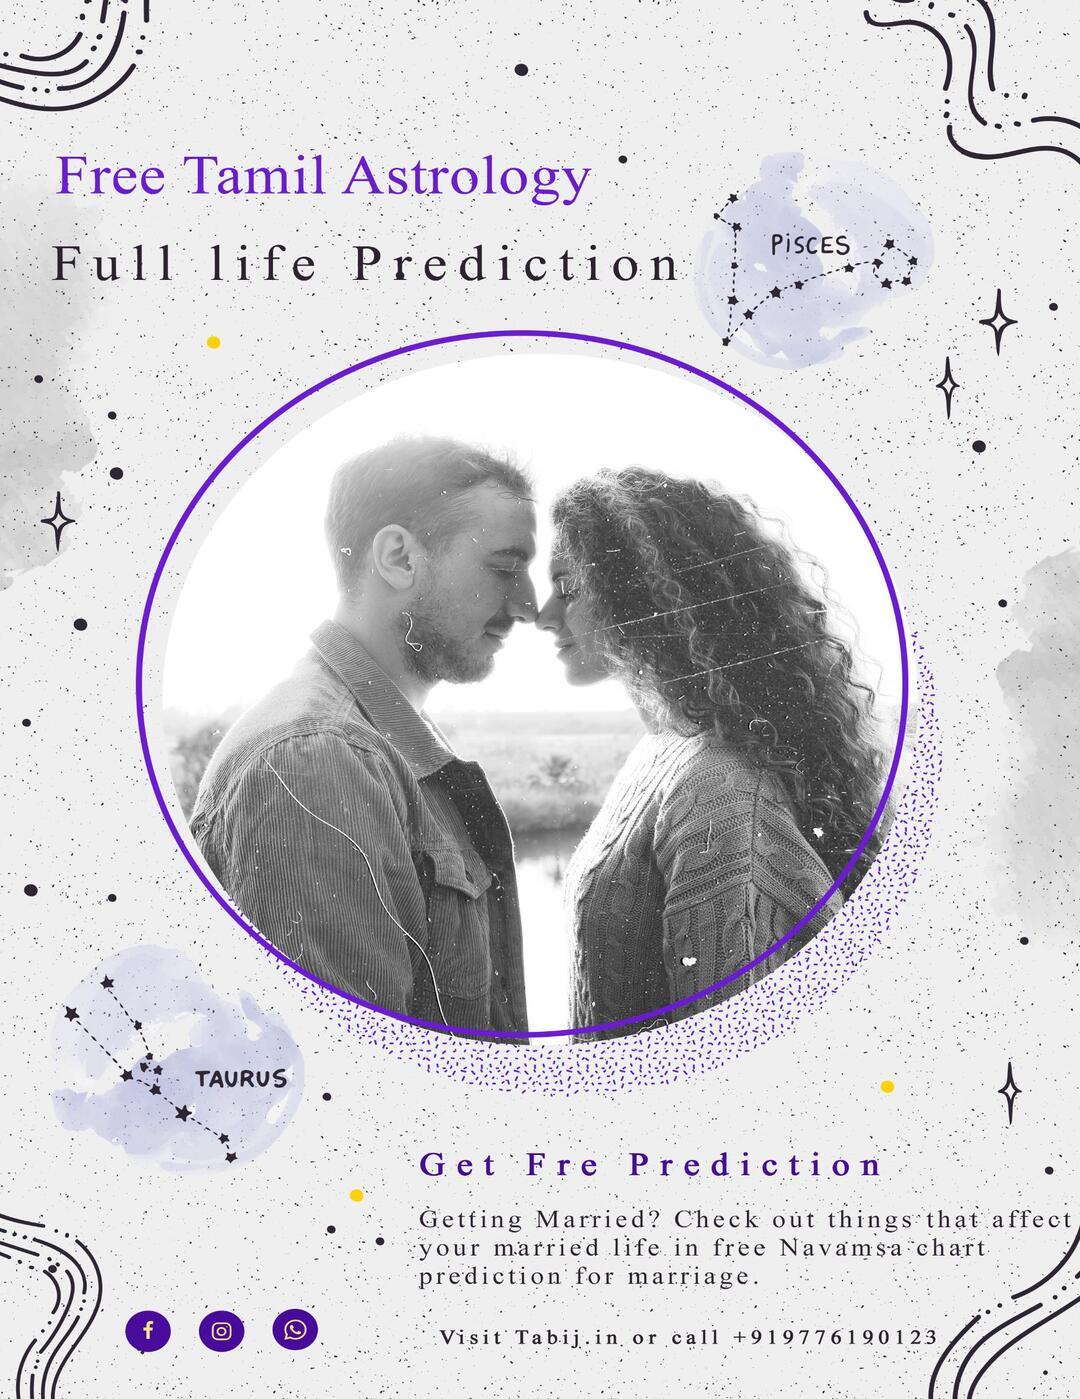 Free Tamil astrology Full life prediction Get Navamsa chart for ...